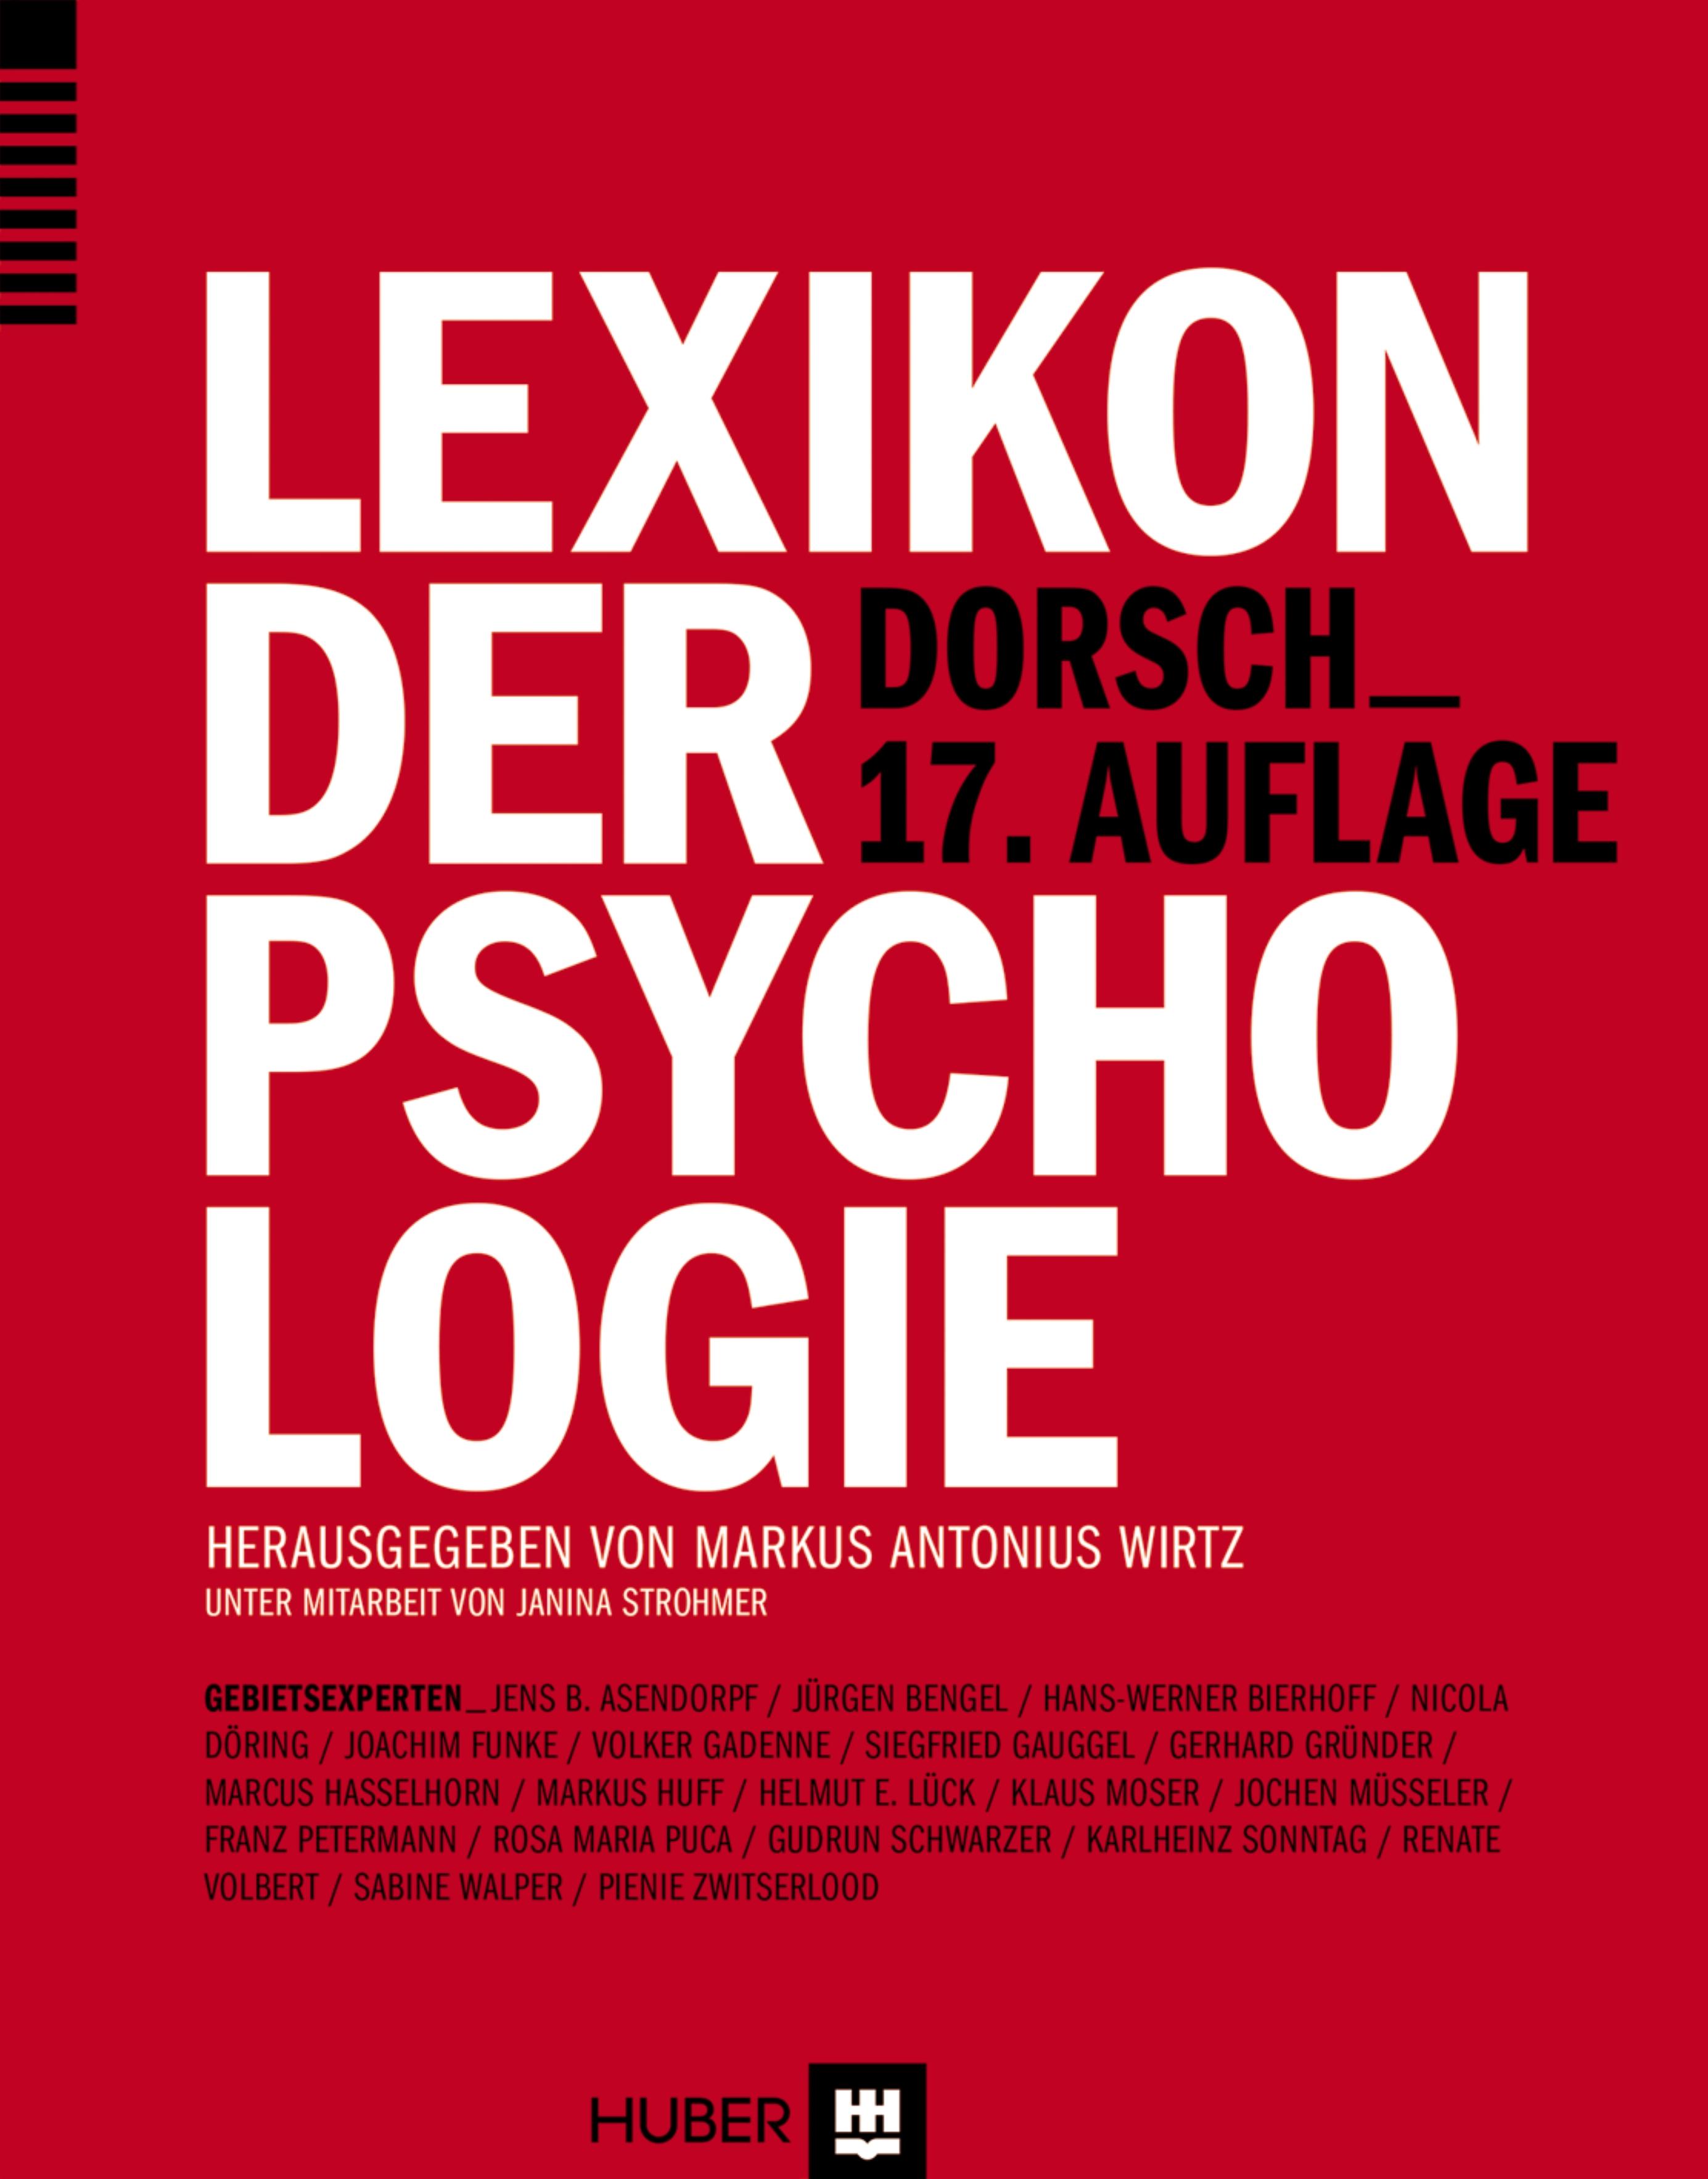 Dorsch - Lexikon der Psychologie - Funke, Joachim